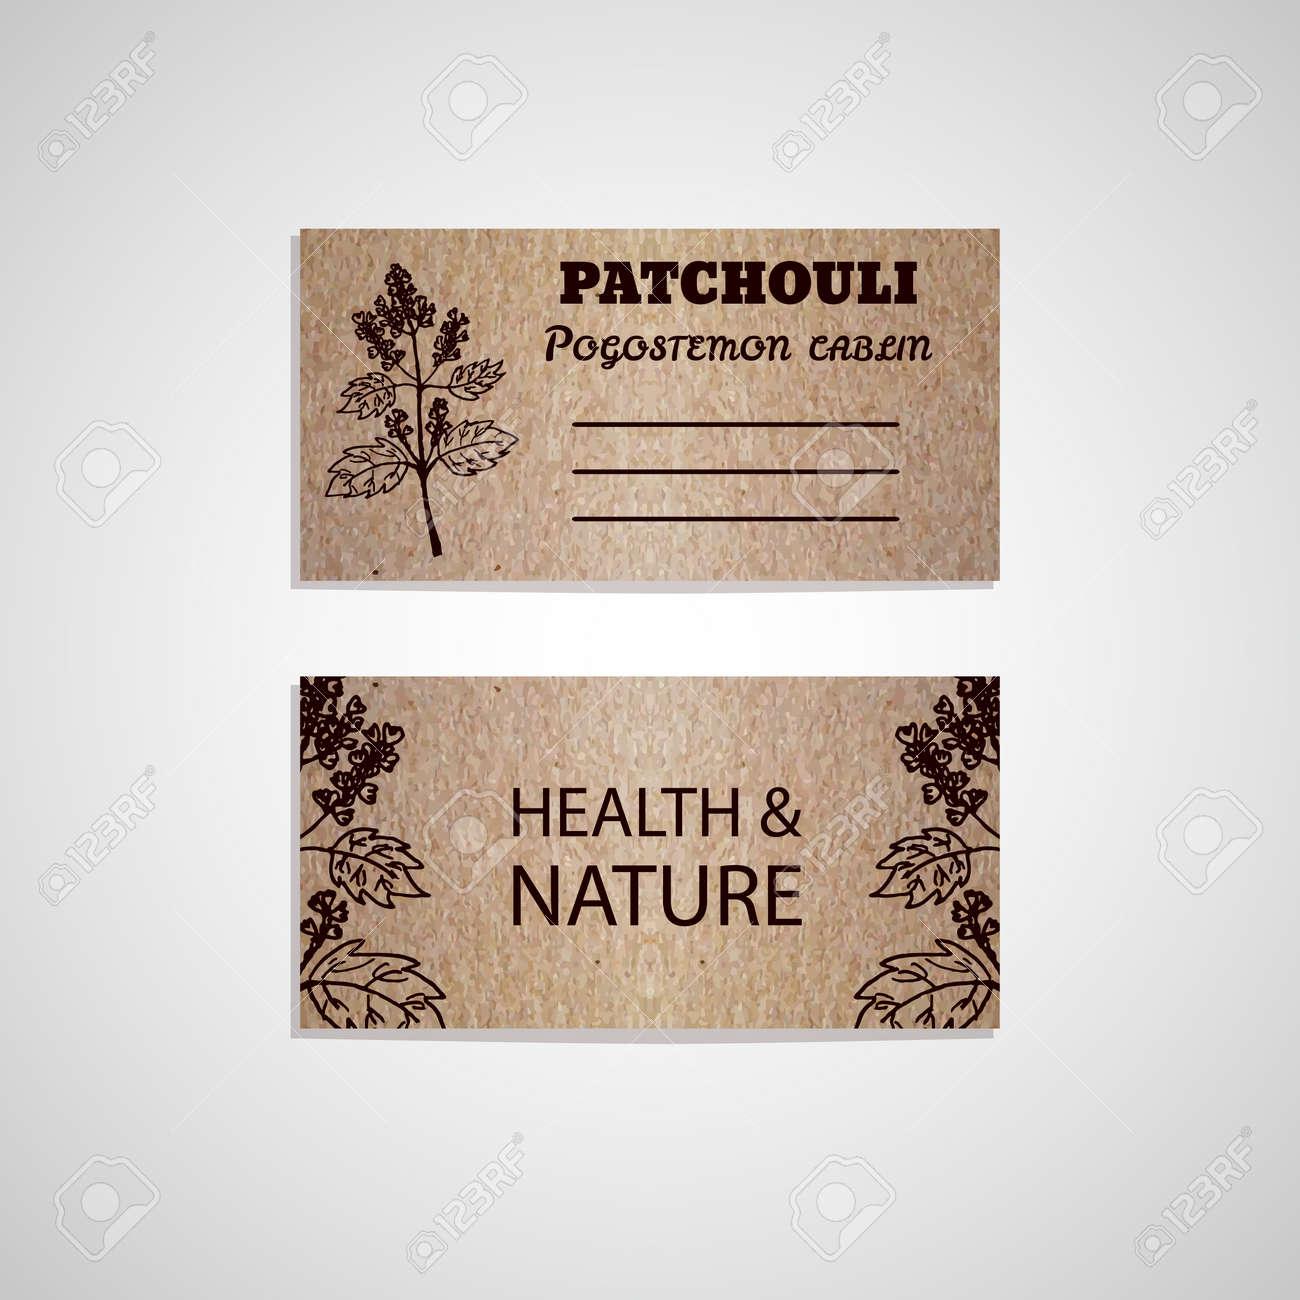 Health and nature collection cardboard business card template health and nature collection cardboard business card template with a herb patchouli pogostemon colourmoves